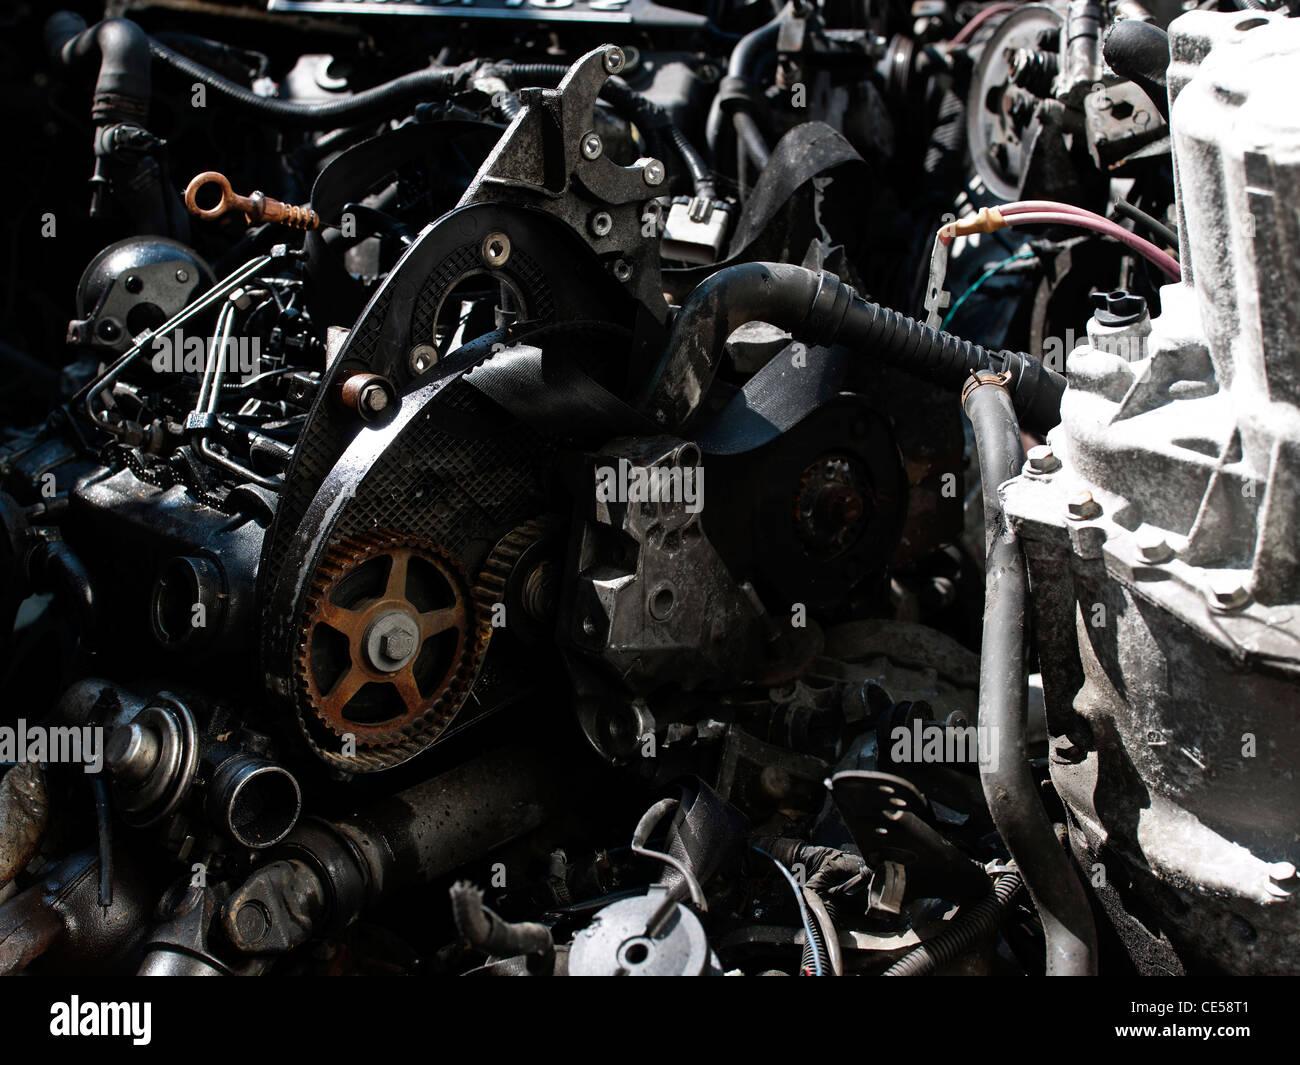 Auto Schrottplatz mit Motorkomponenten Stockfoto, Bild: 43142625 - Alamy